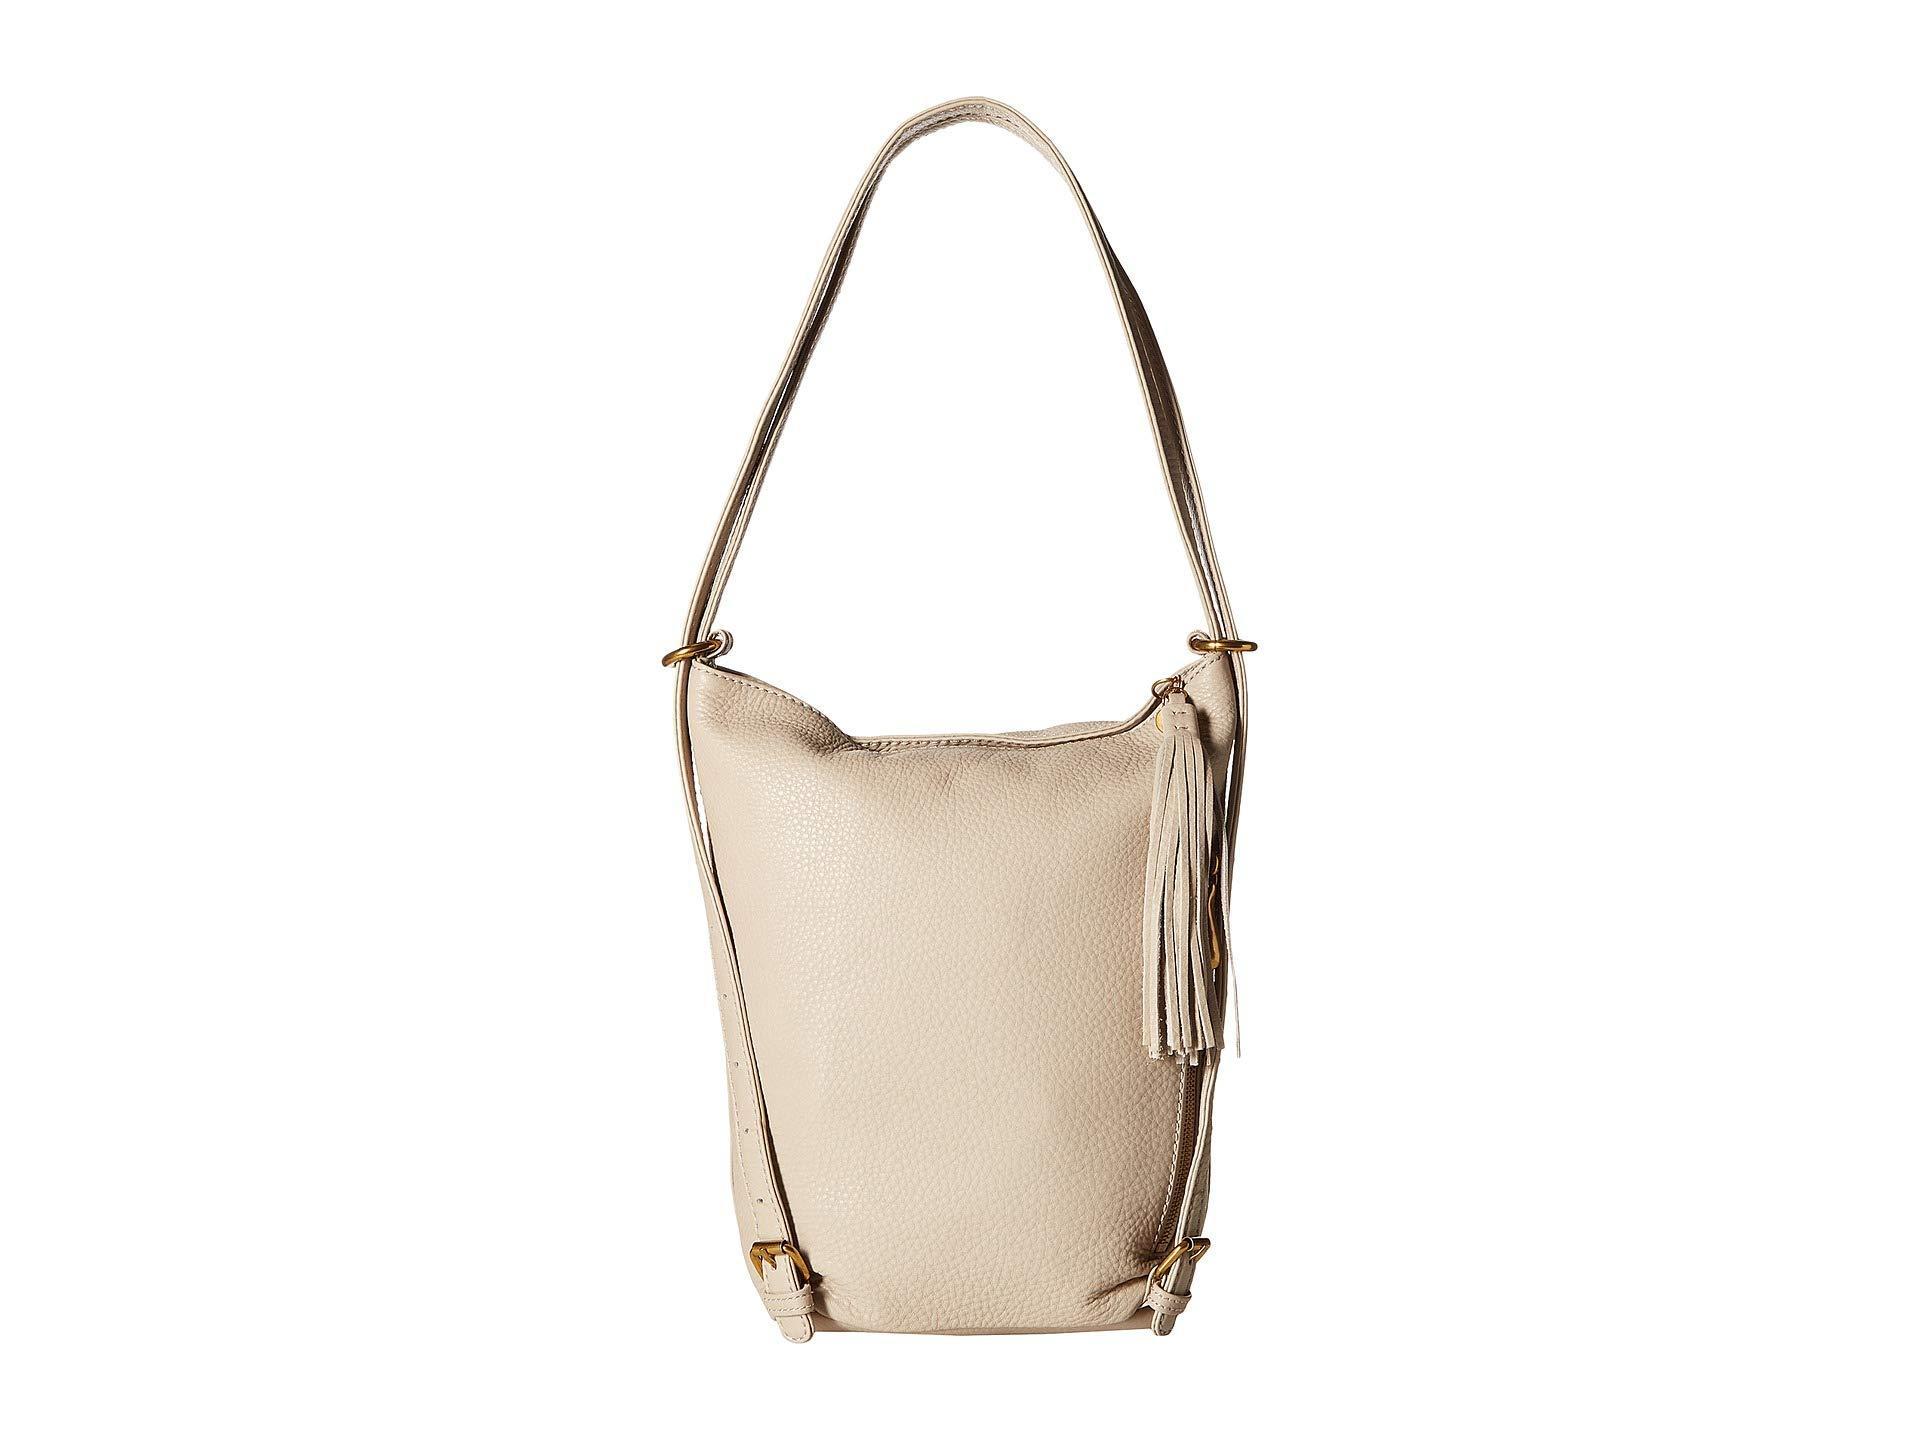 71ddb57e2e4e Hobo - Natural Blaze (black) Shoulder Handbags - Lyst. View fullscreen